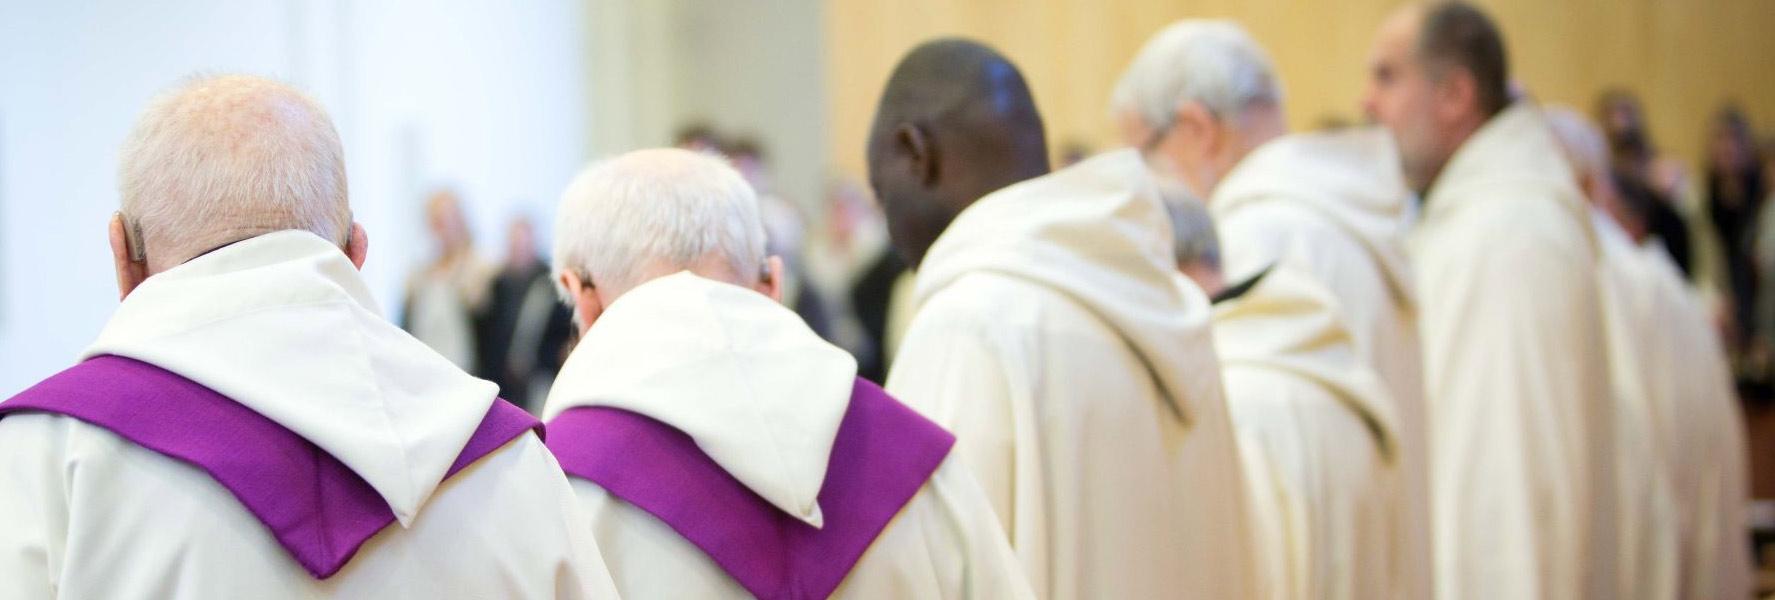 Abtei Westmalle Ordensgemeinschaft